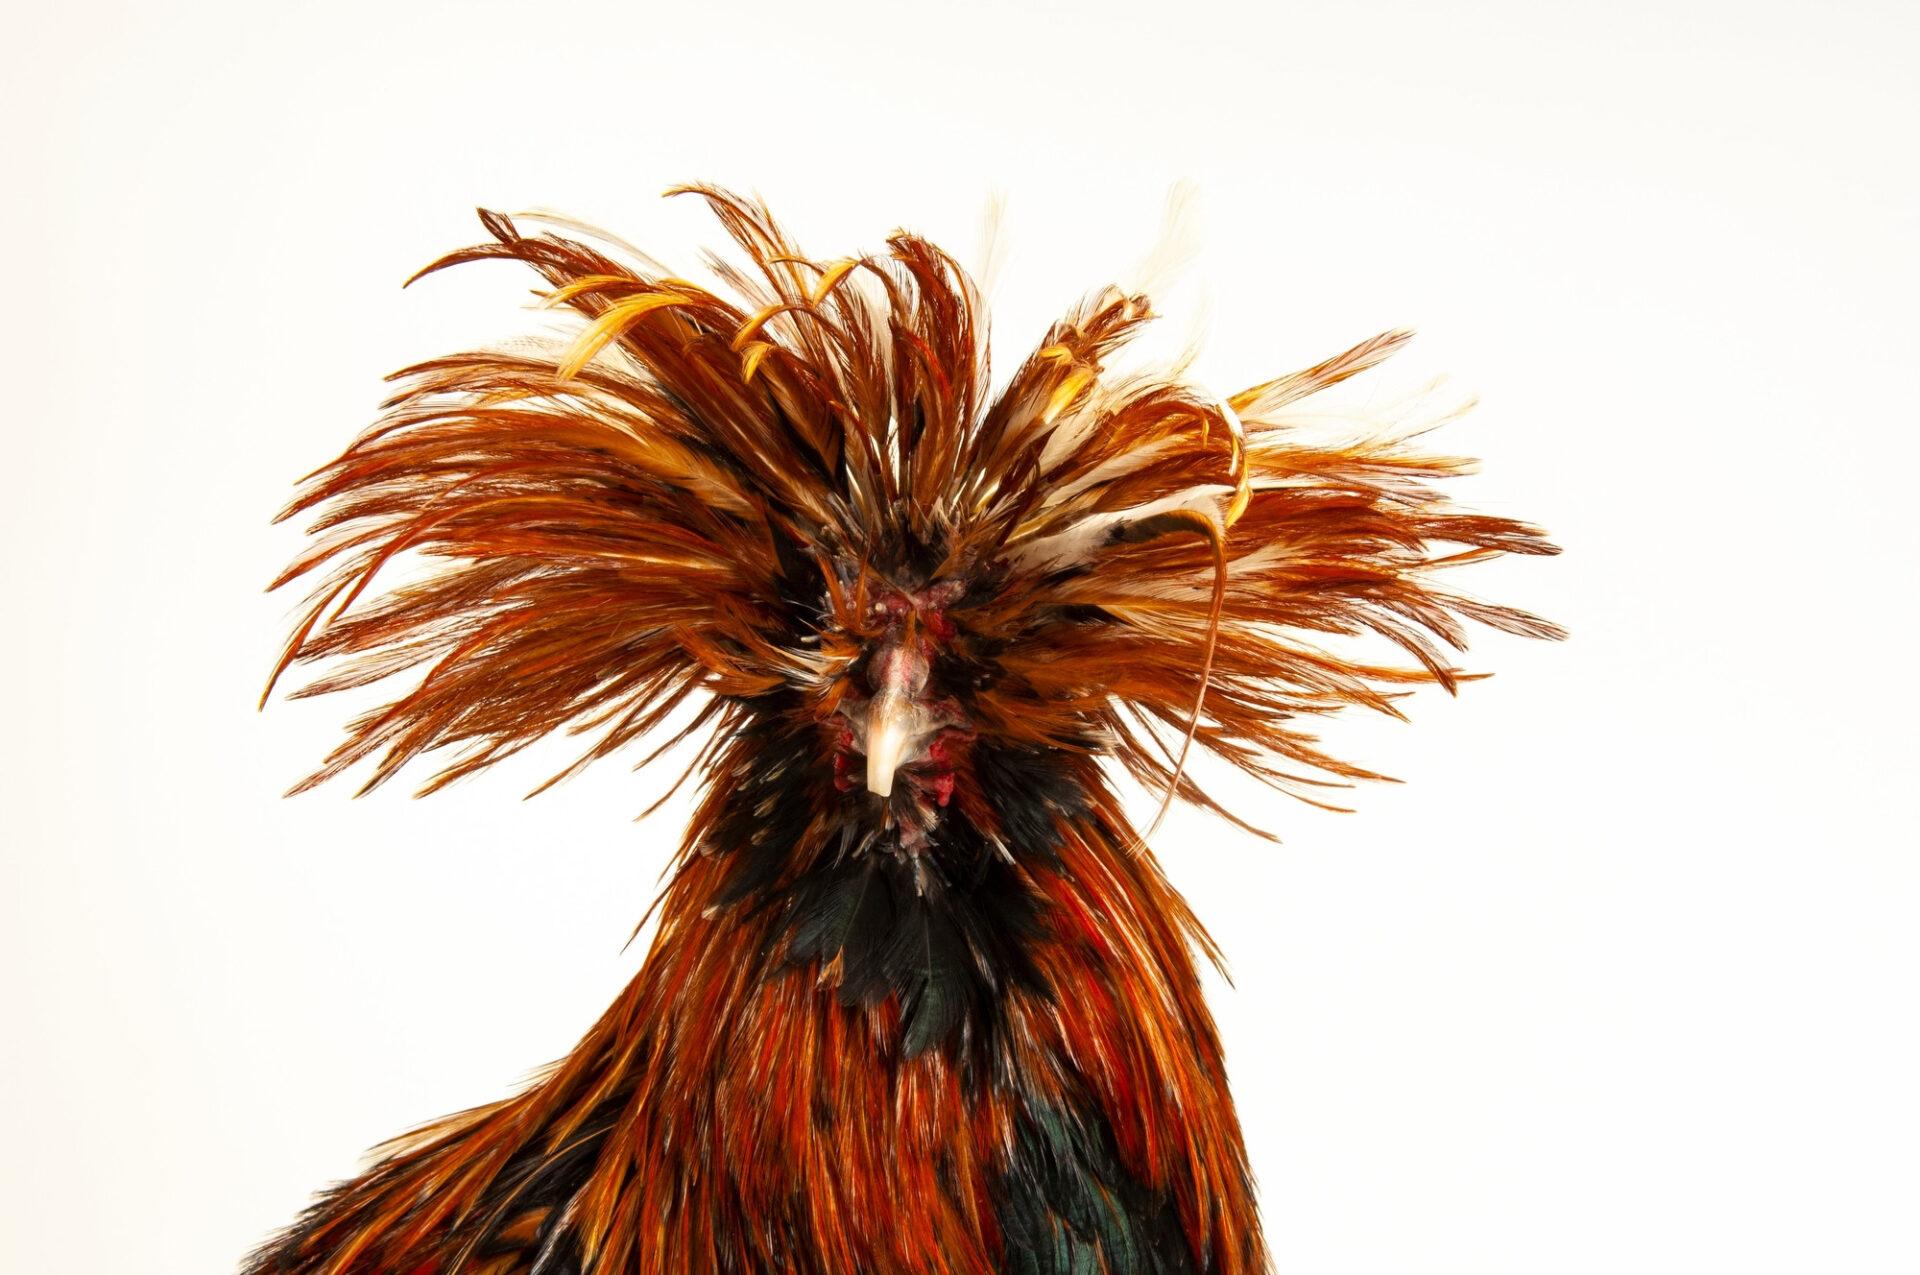 Photo: Buckwheat, a golden Polish chicken at the Soukup Farm.